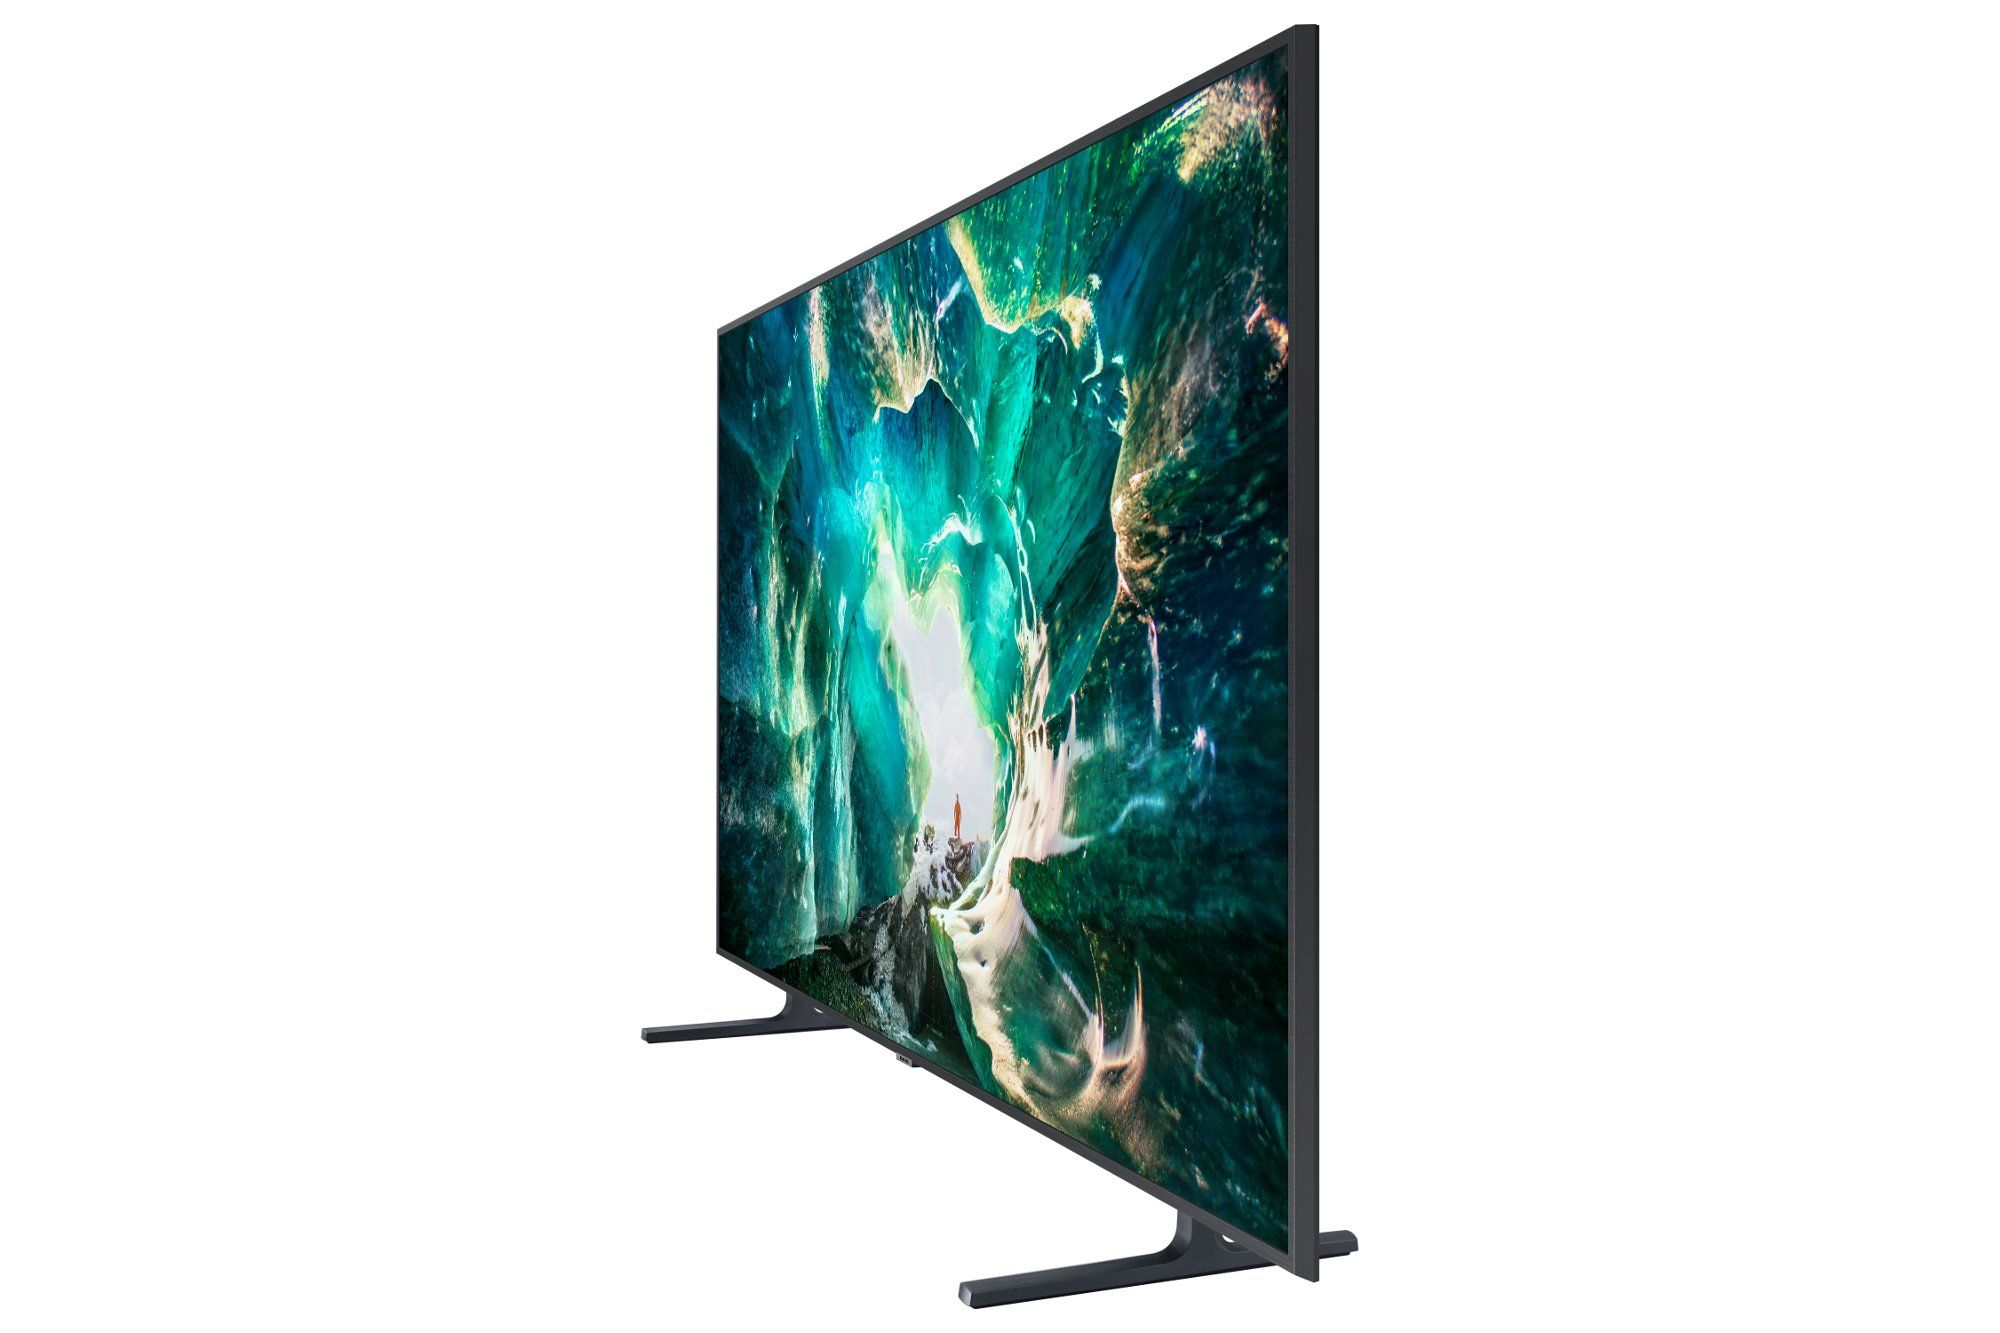 Samsung RU8000 75 Inch Premium 4K UHD Smart TV Samsung